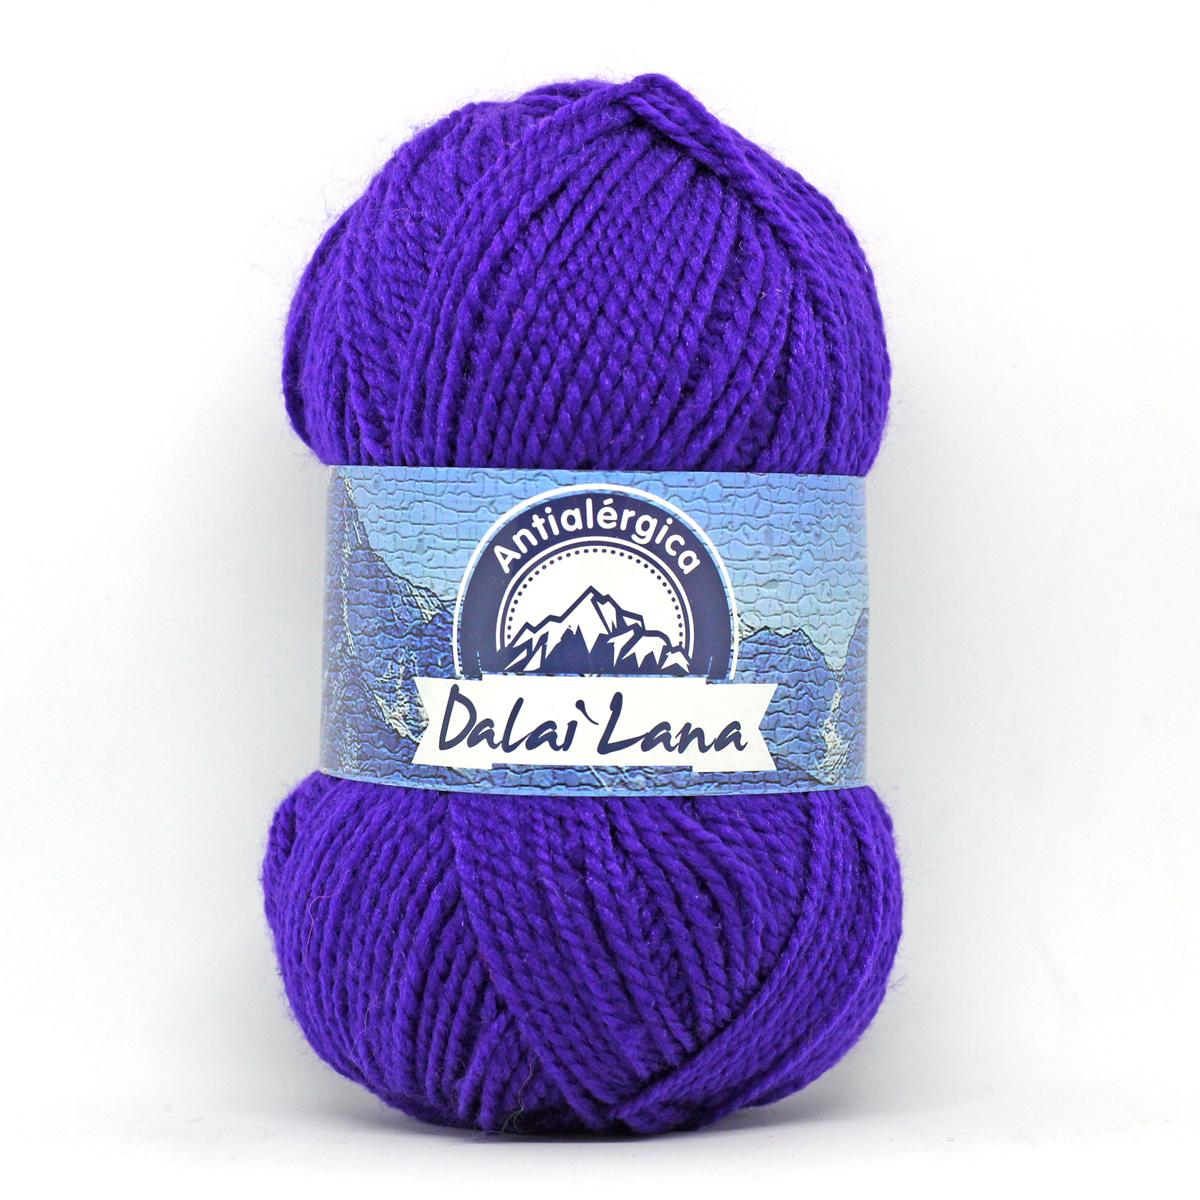 Dalai Lana - 768